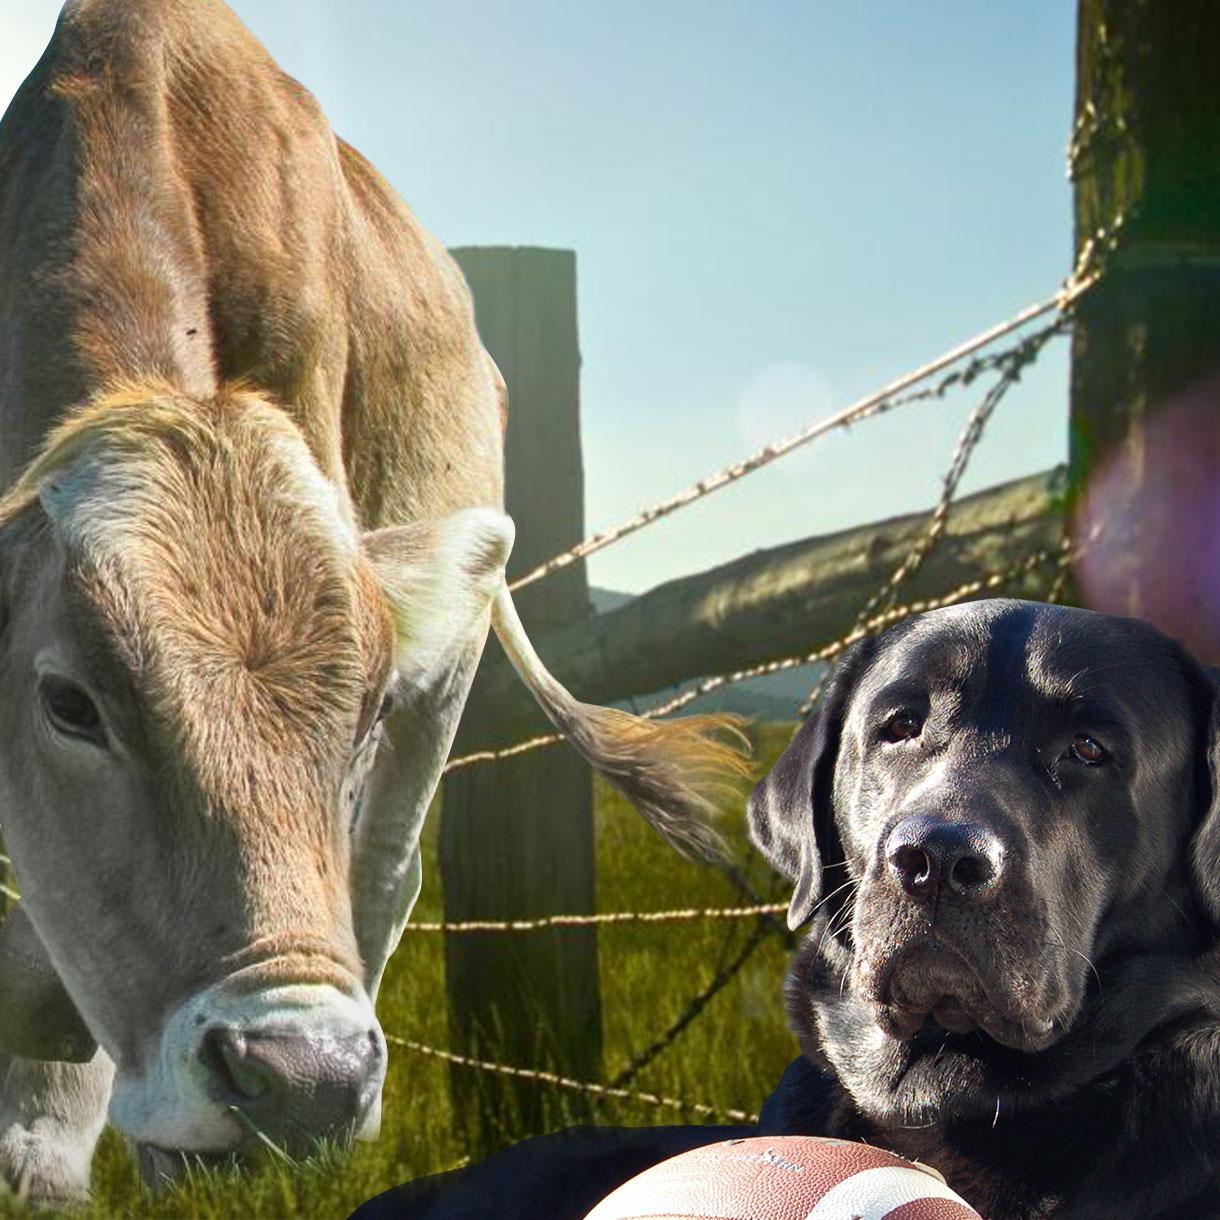 bg-farmhomegarden-sm02.jpg